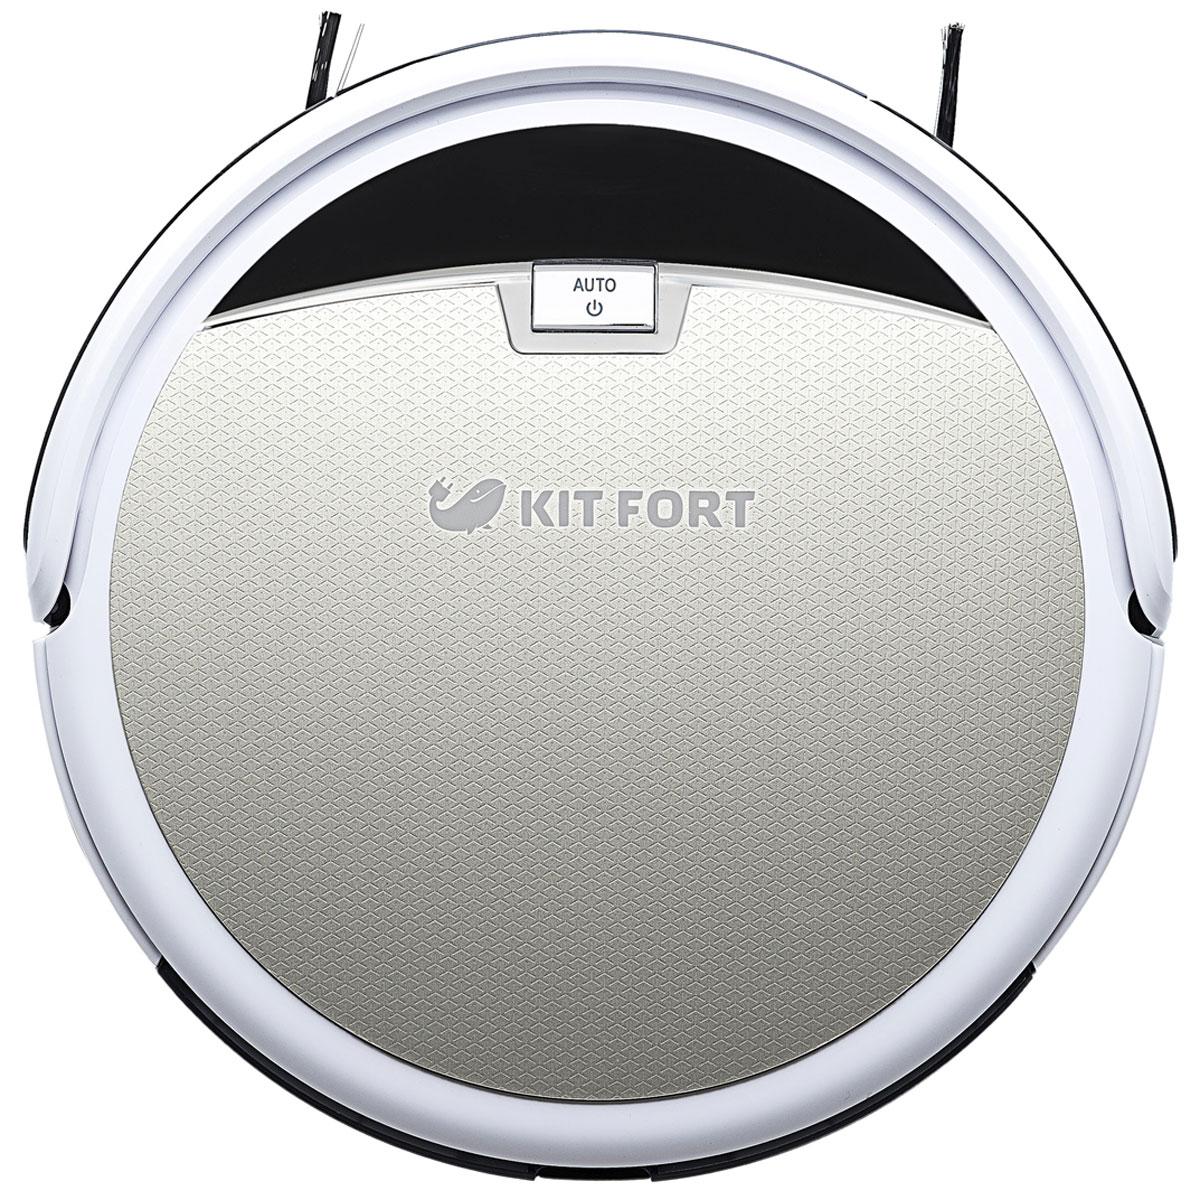 Kitfort KT-519-2, Silver робот-пылесос